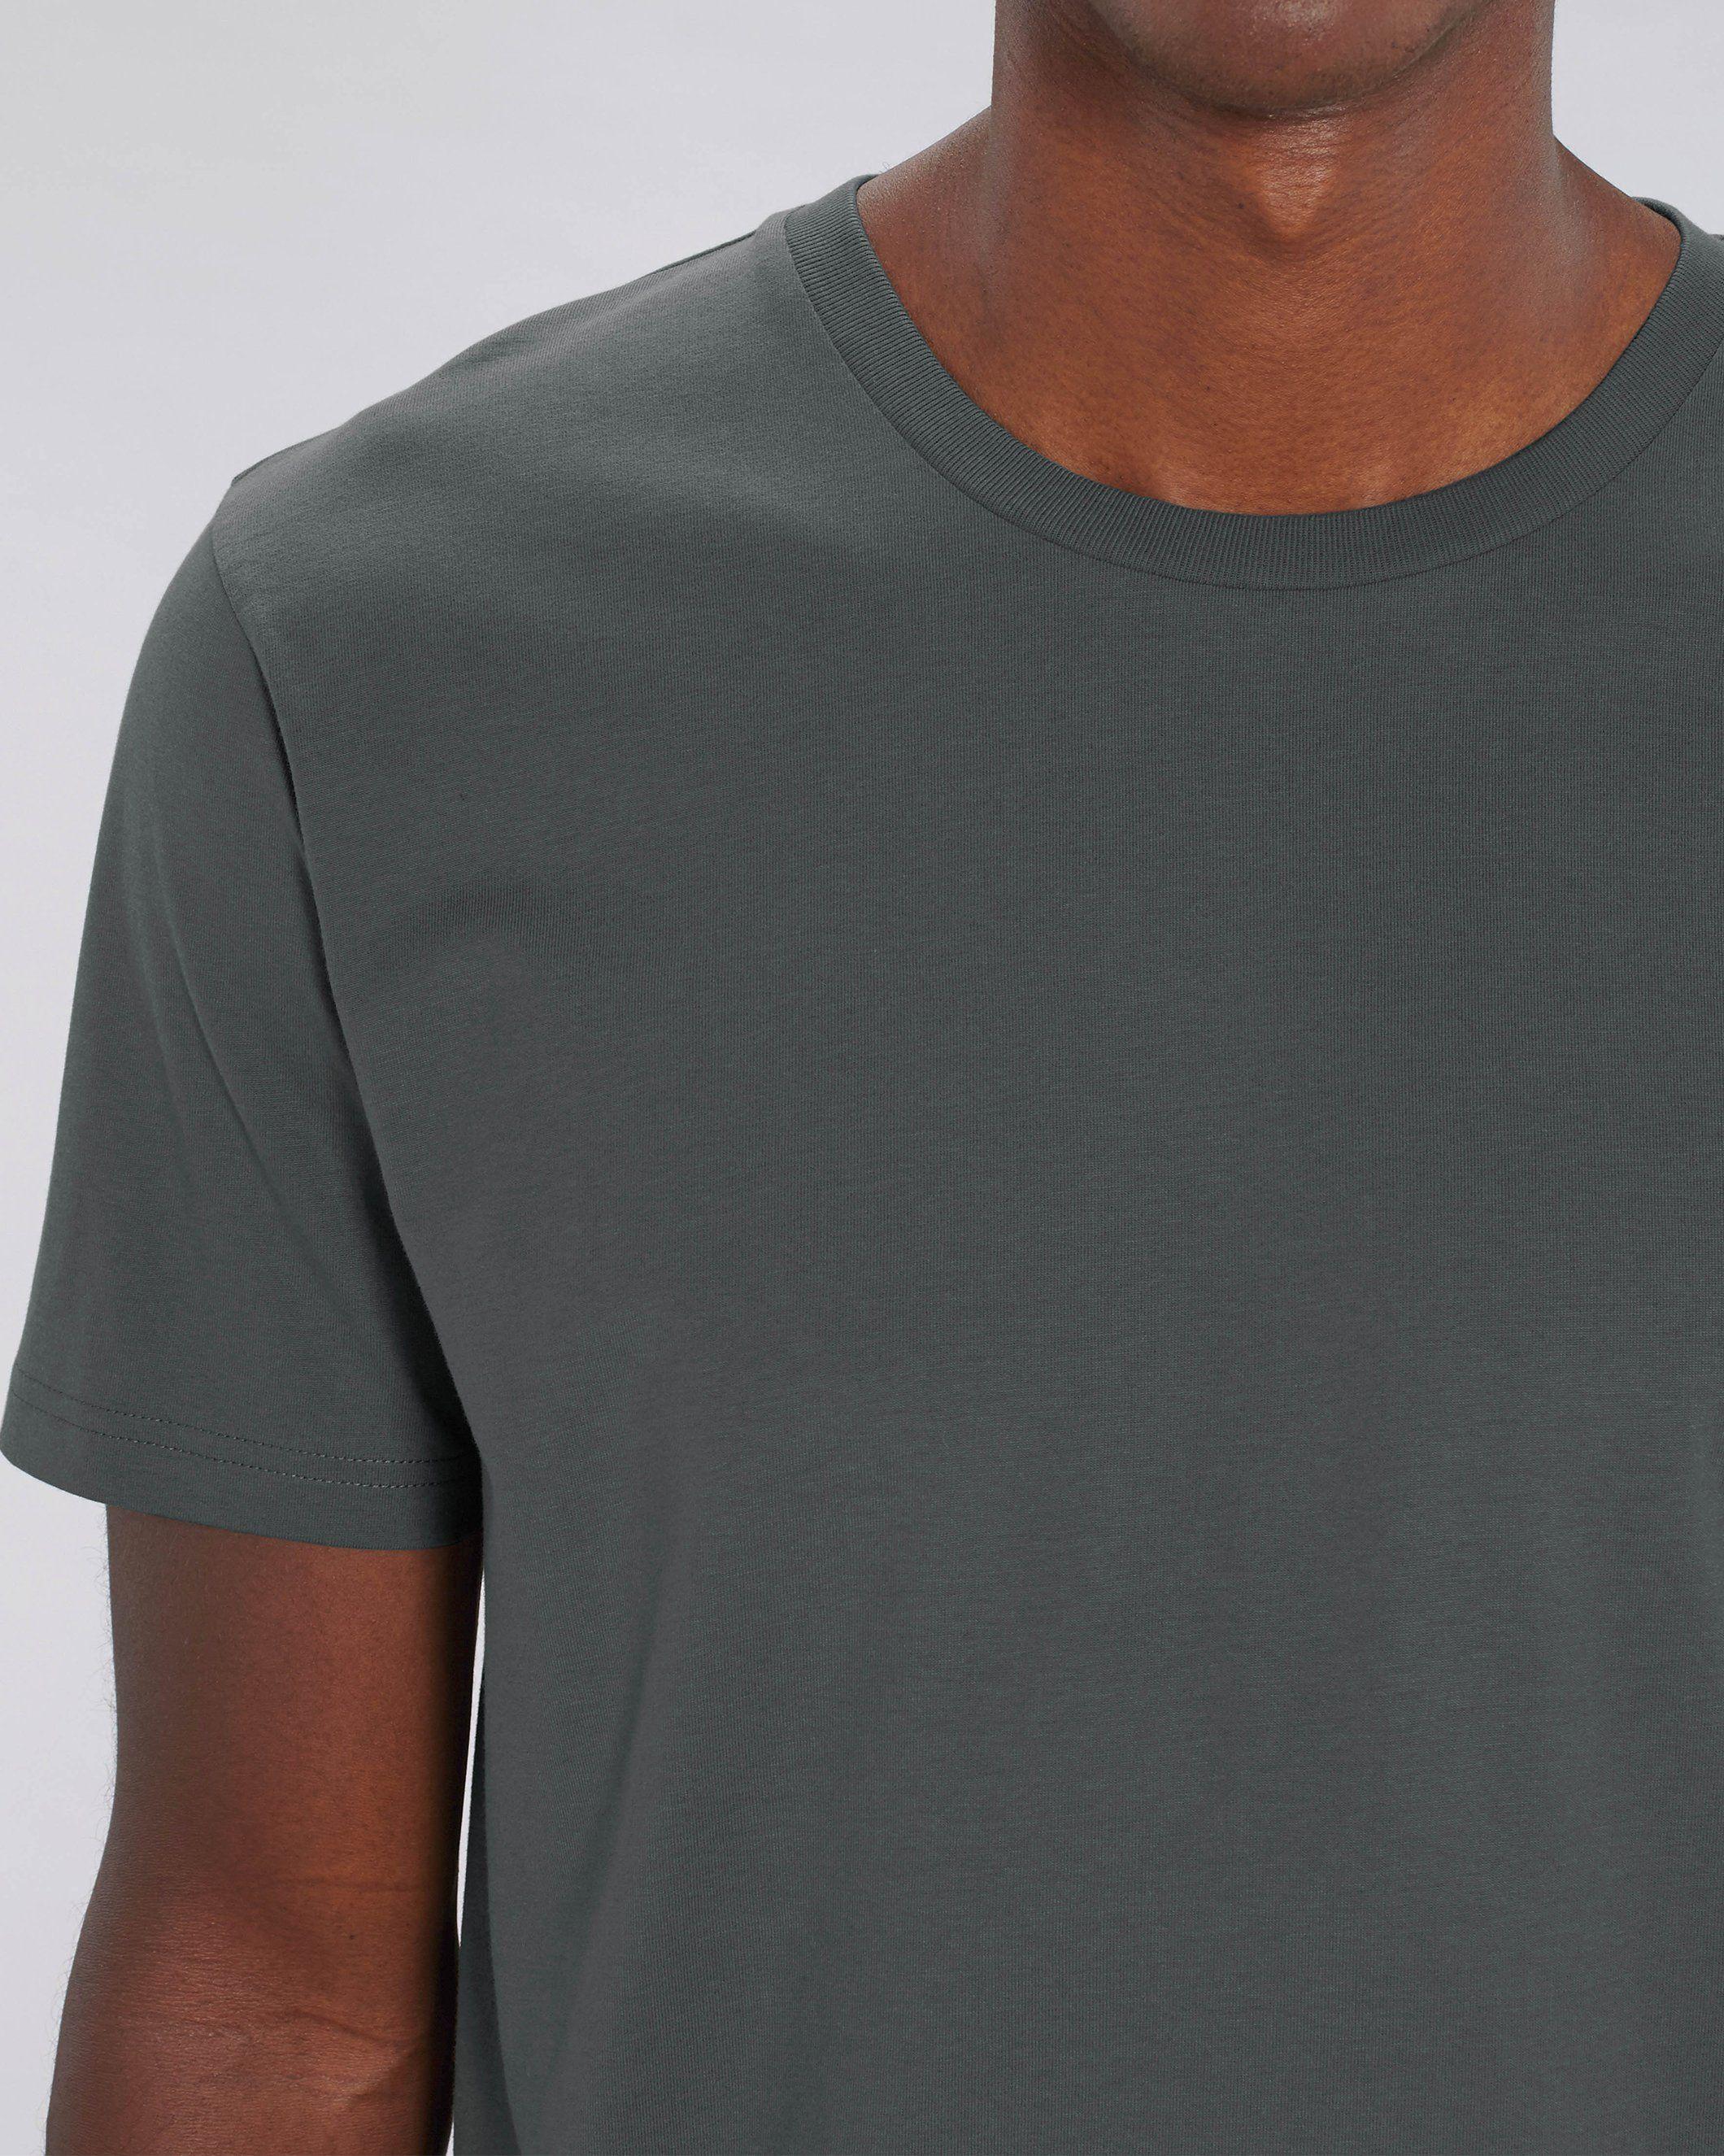 Nauli Unisex Regular Fit T-Shirt in Charcoal